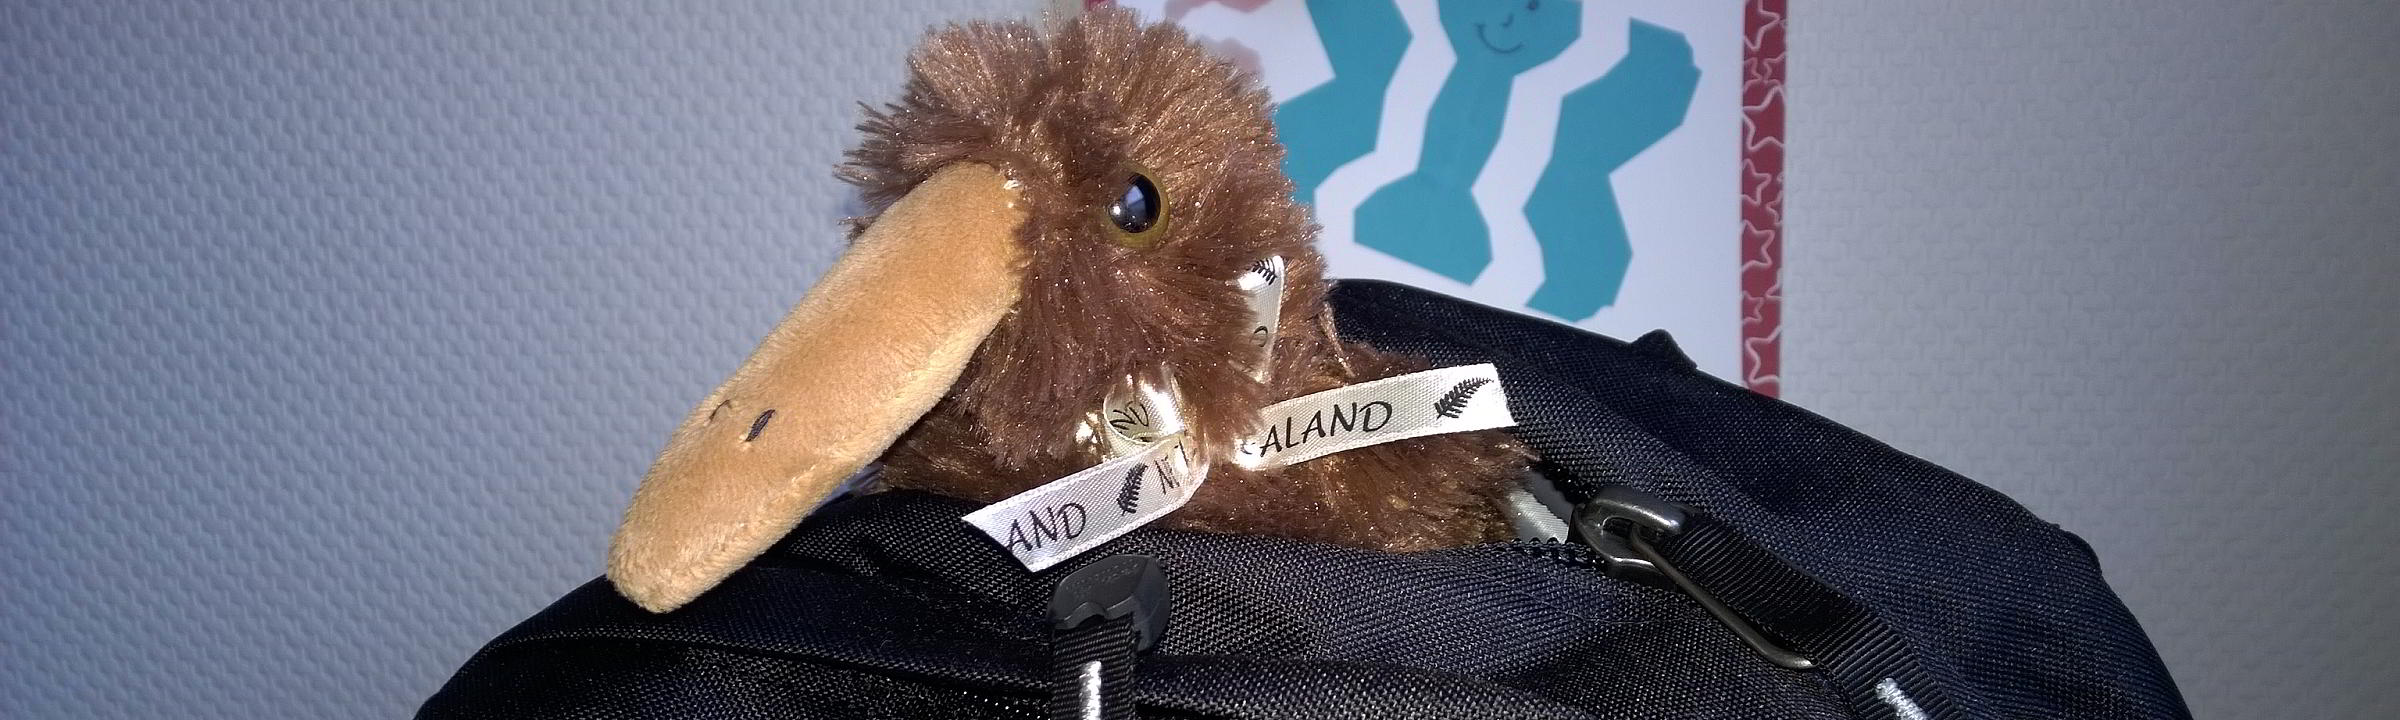 Ein Kiwi auf Reisen